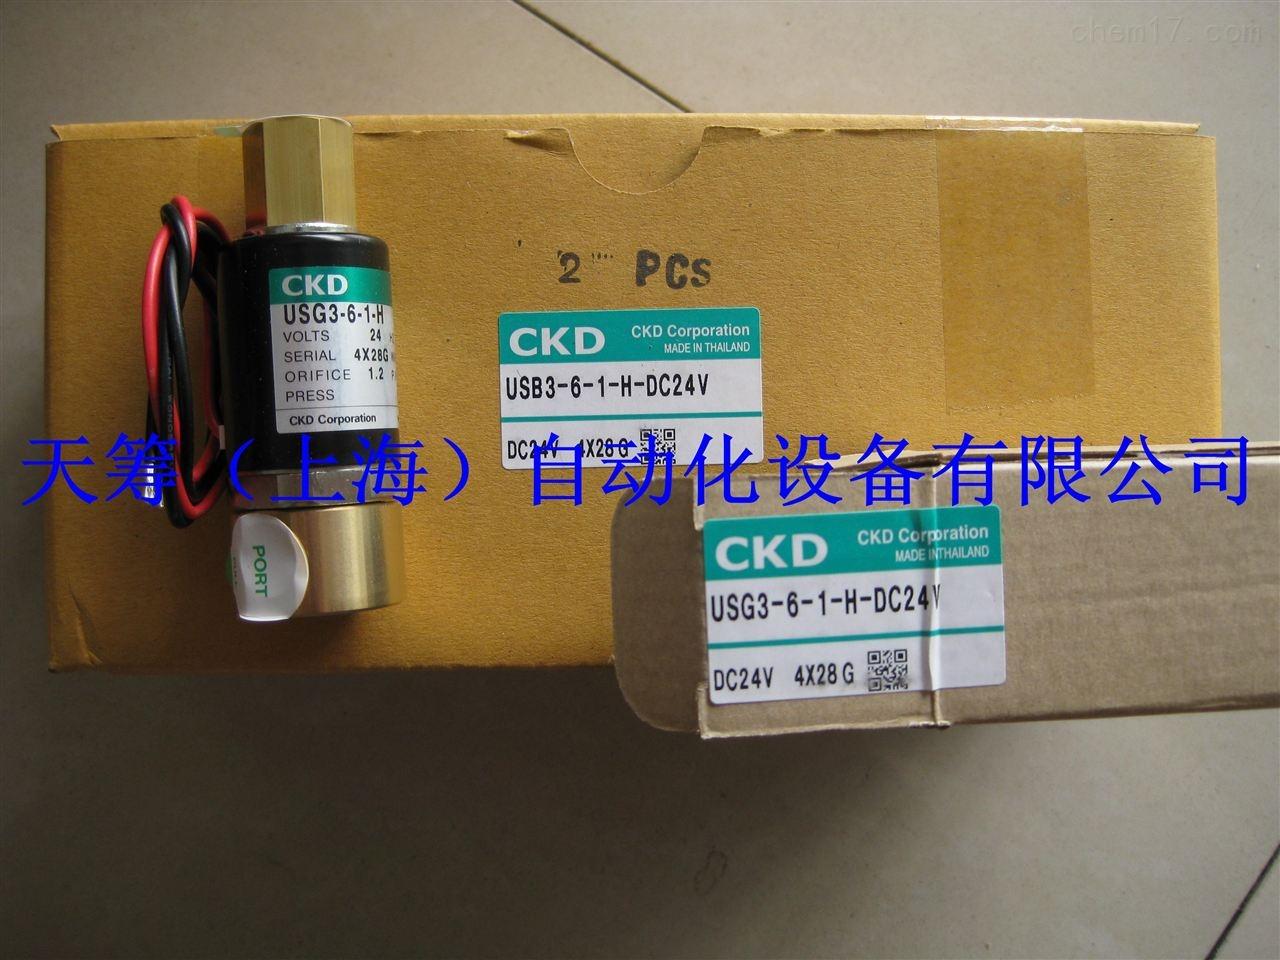 CKD电磁阀USB3-6-1-H-DC24V